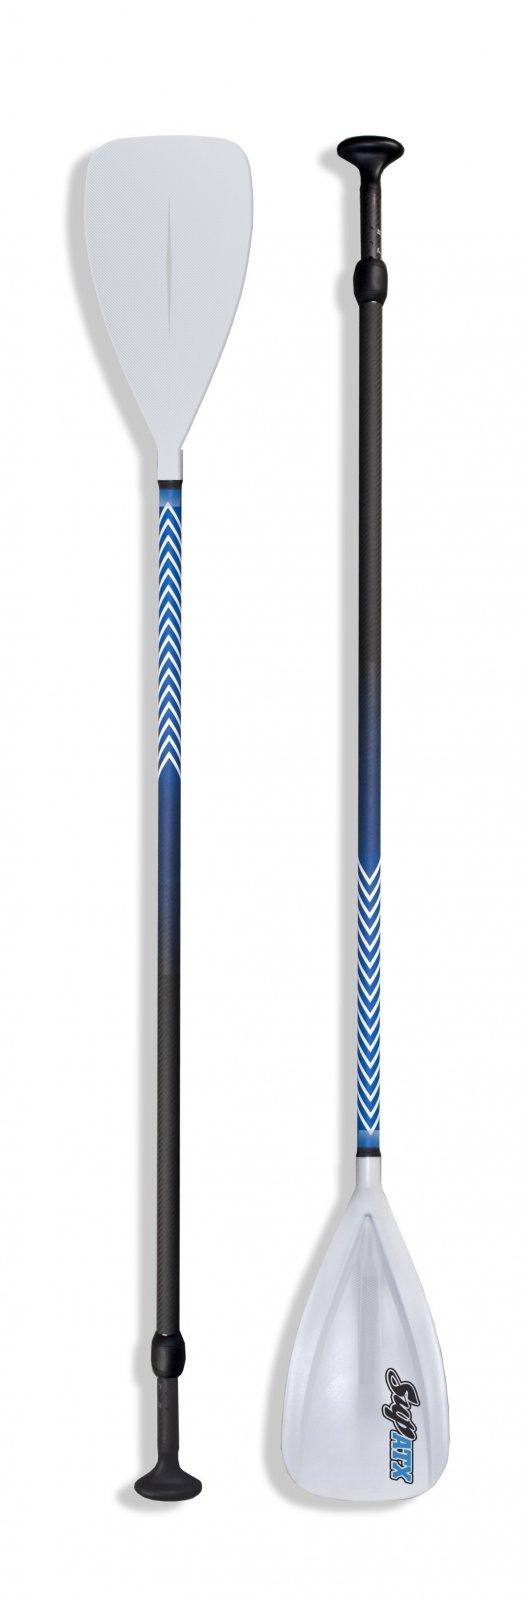 SUP ATX CN7 Carbon Fiber Adjustable Paddle